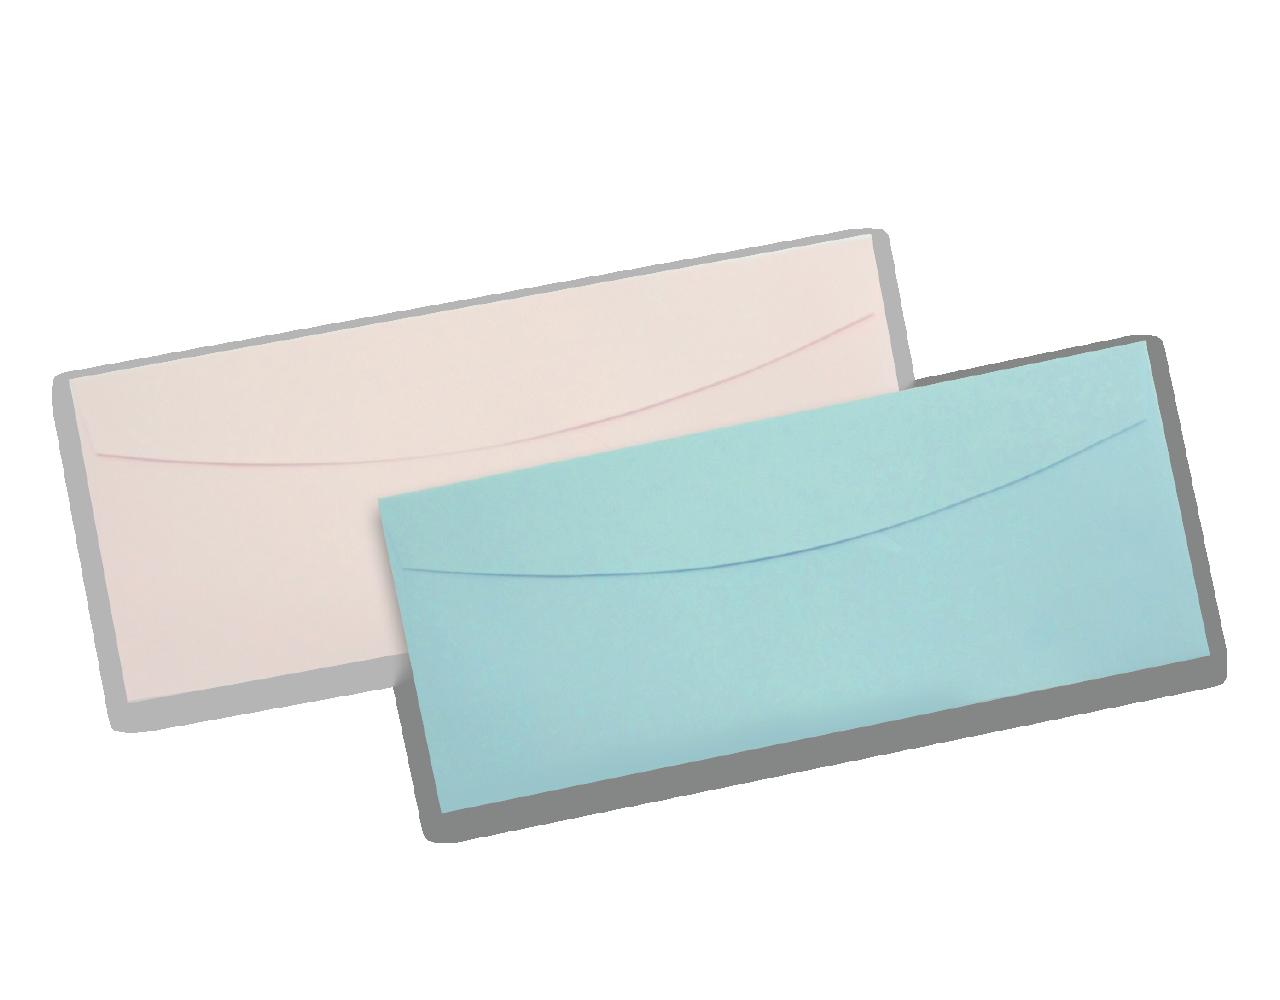 Envelope 10.3 x 25.5 cm. 100 g ฿ 2.50